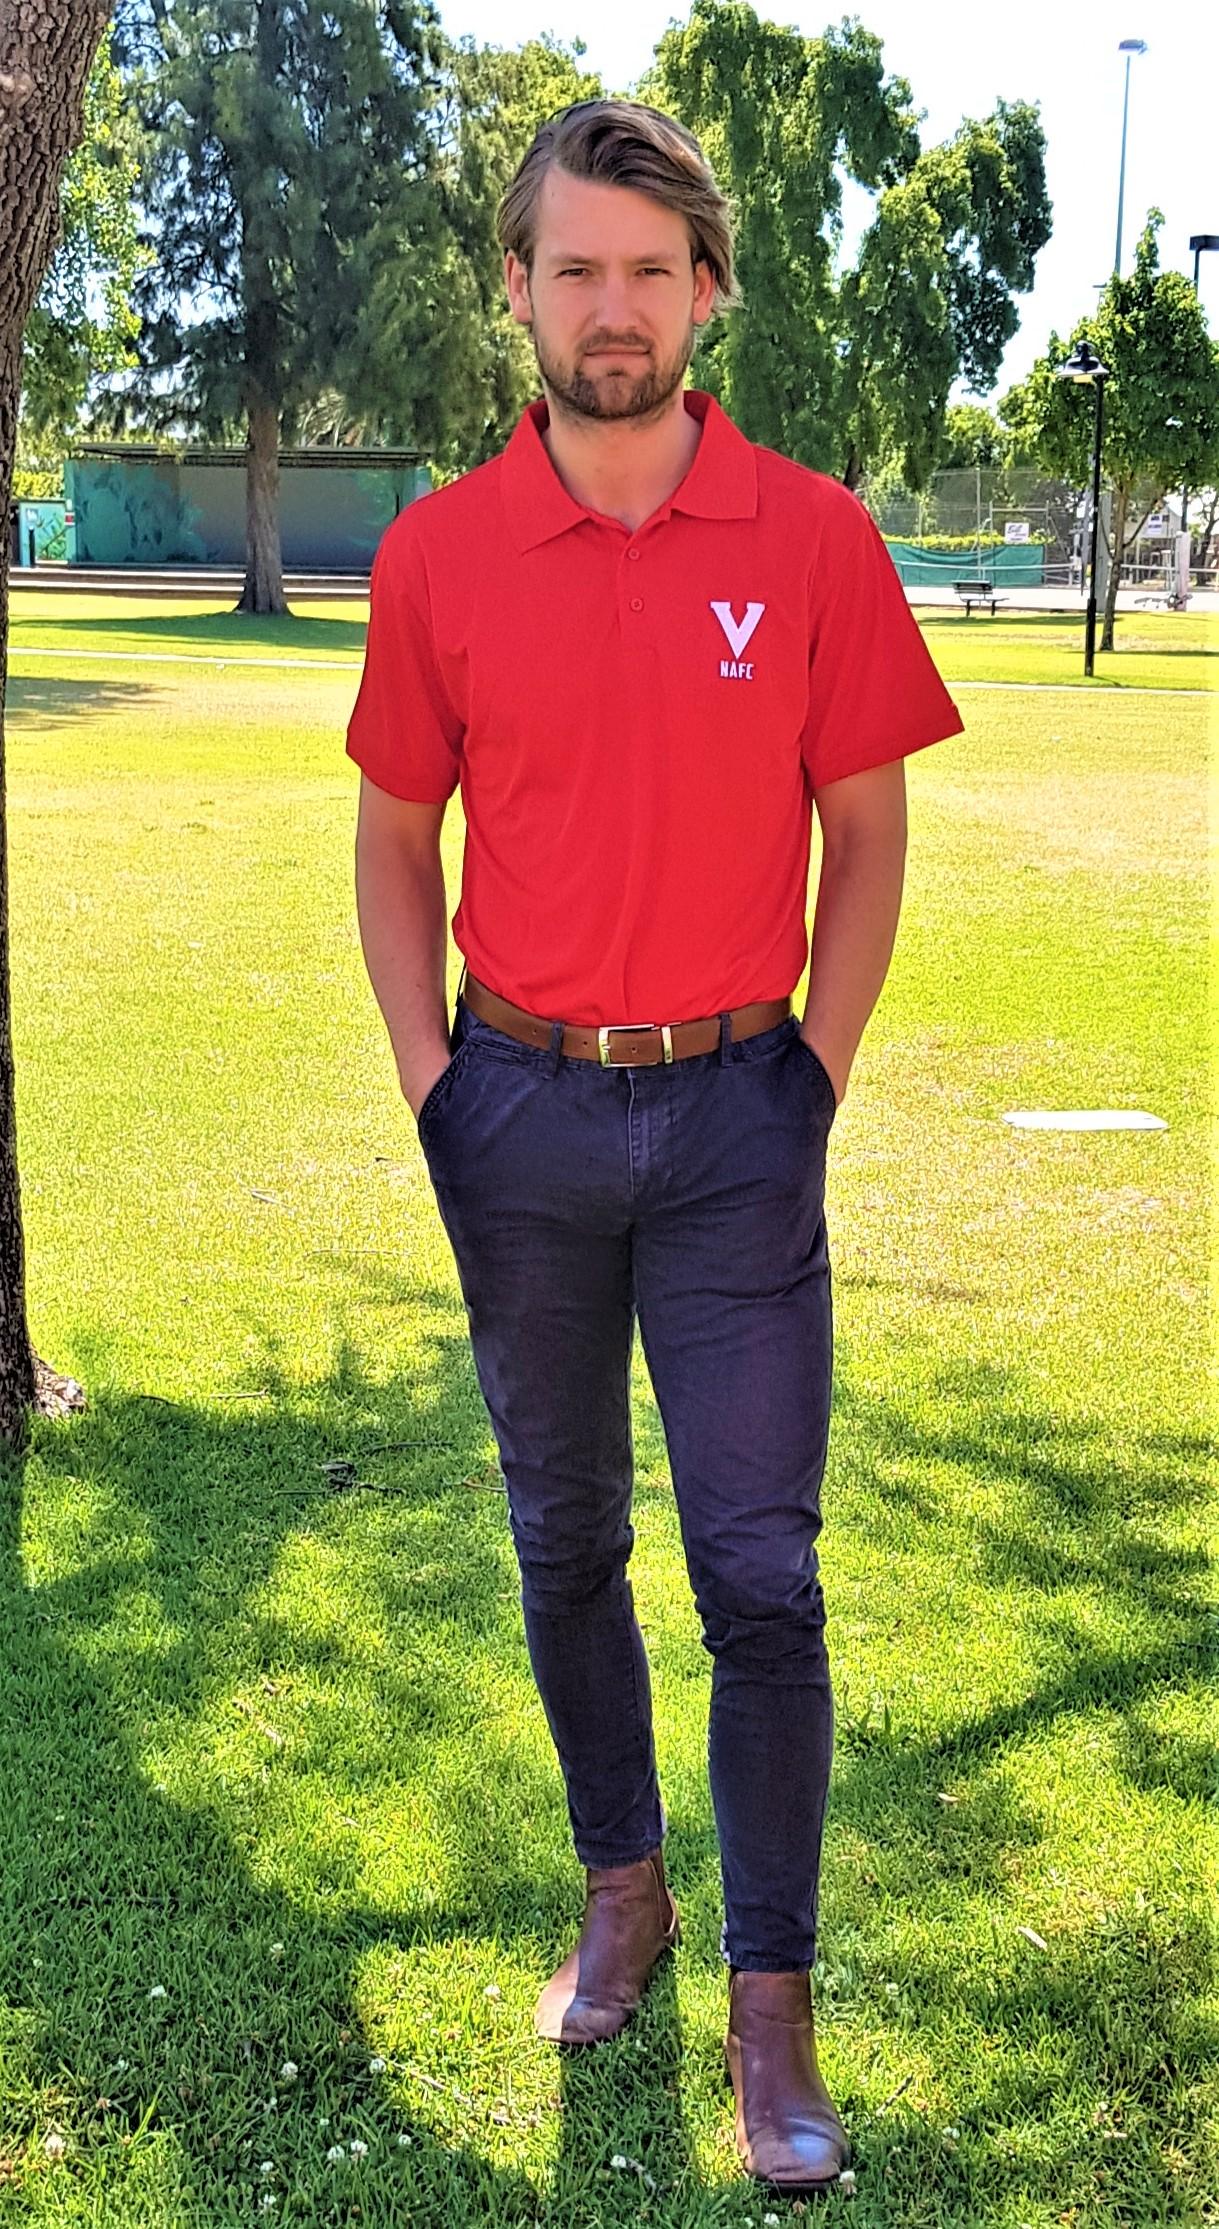 Red V Polo